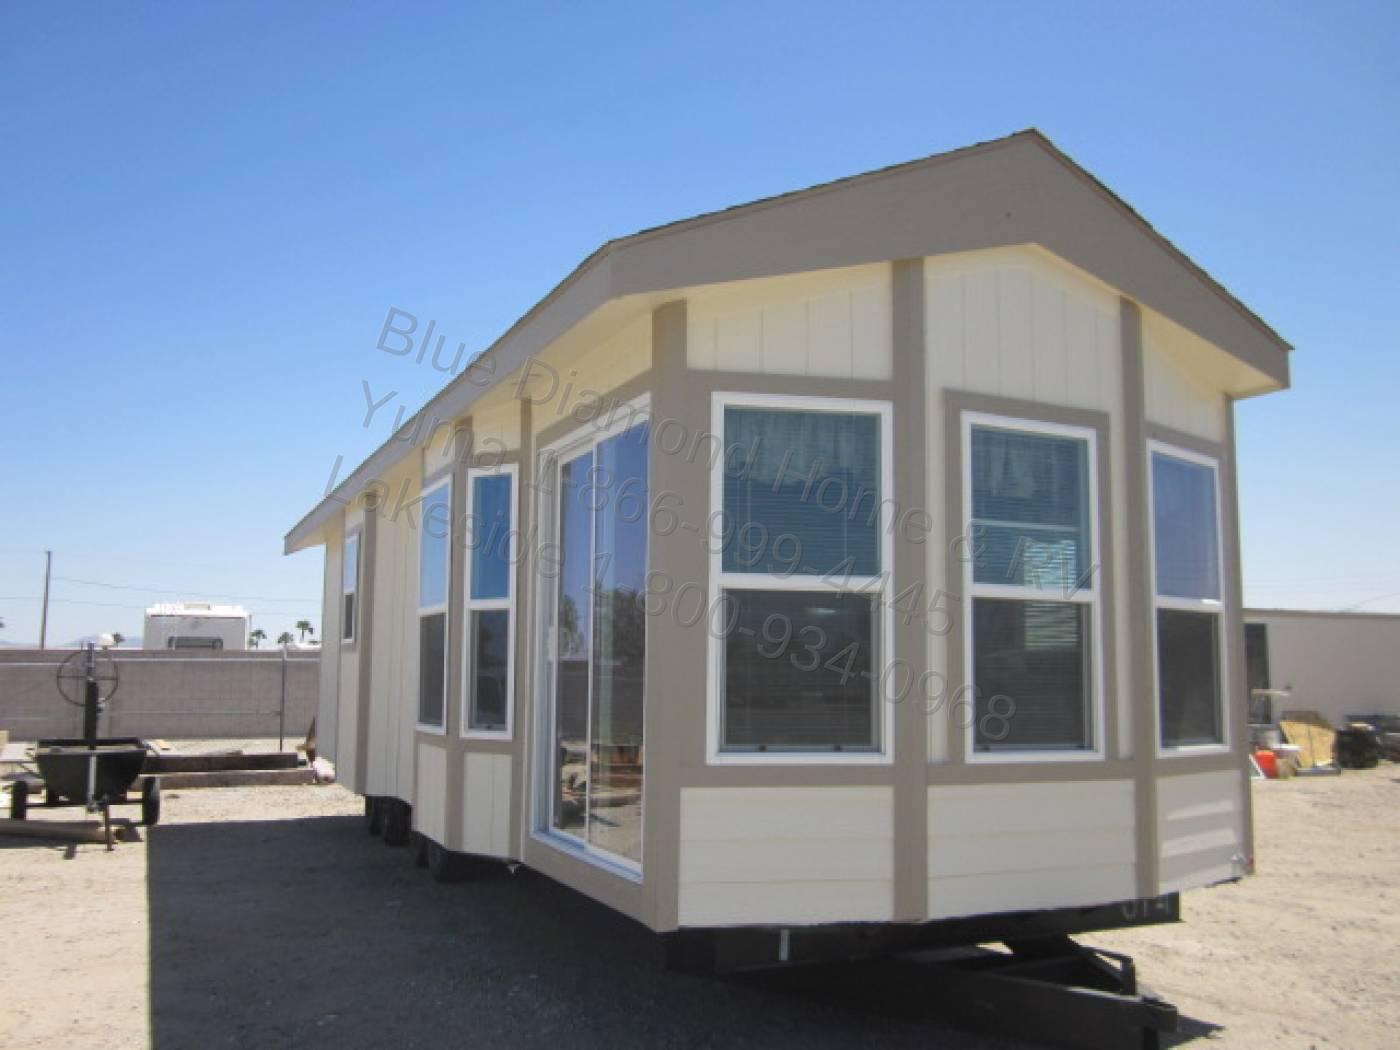 Park Models Clayton Copper Series Blue Diamond Home